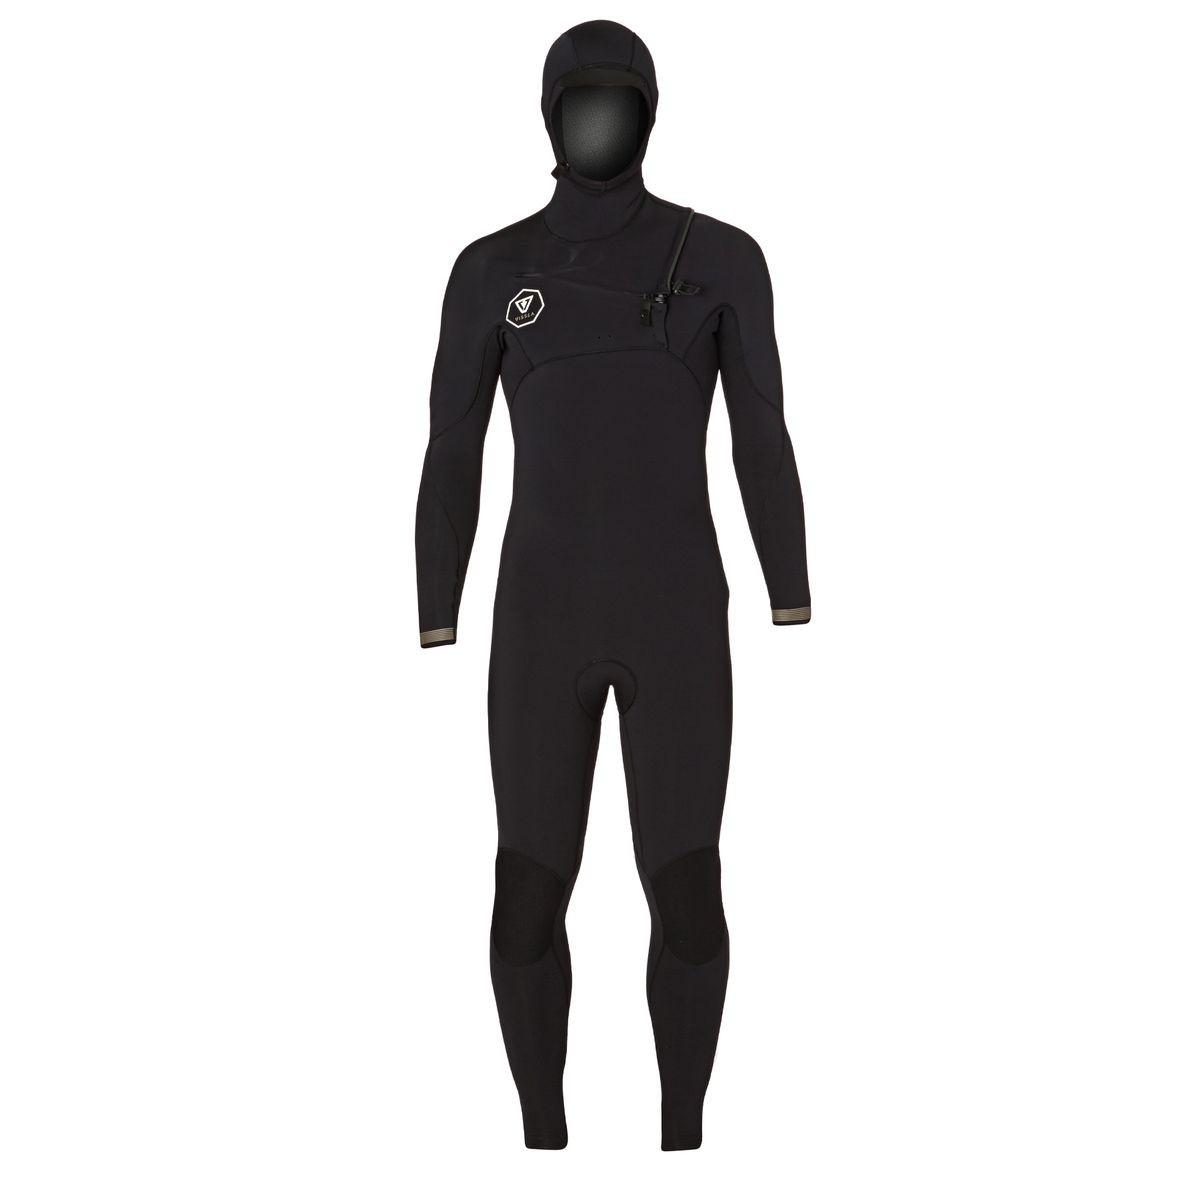 Vissla Seven Seas 4/3mm Hooded Chest Zip Wetsuit - Black/ Gold